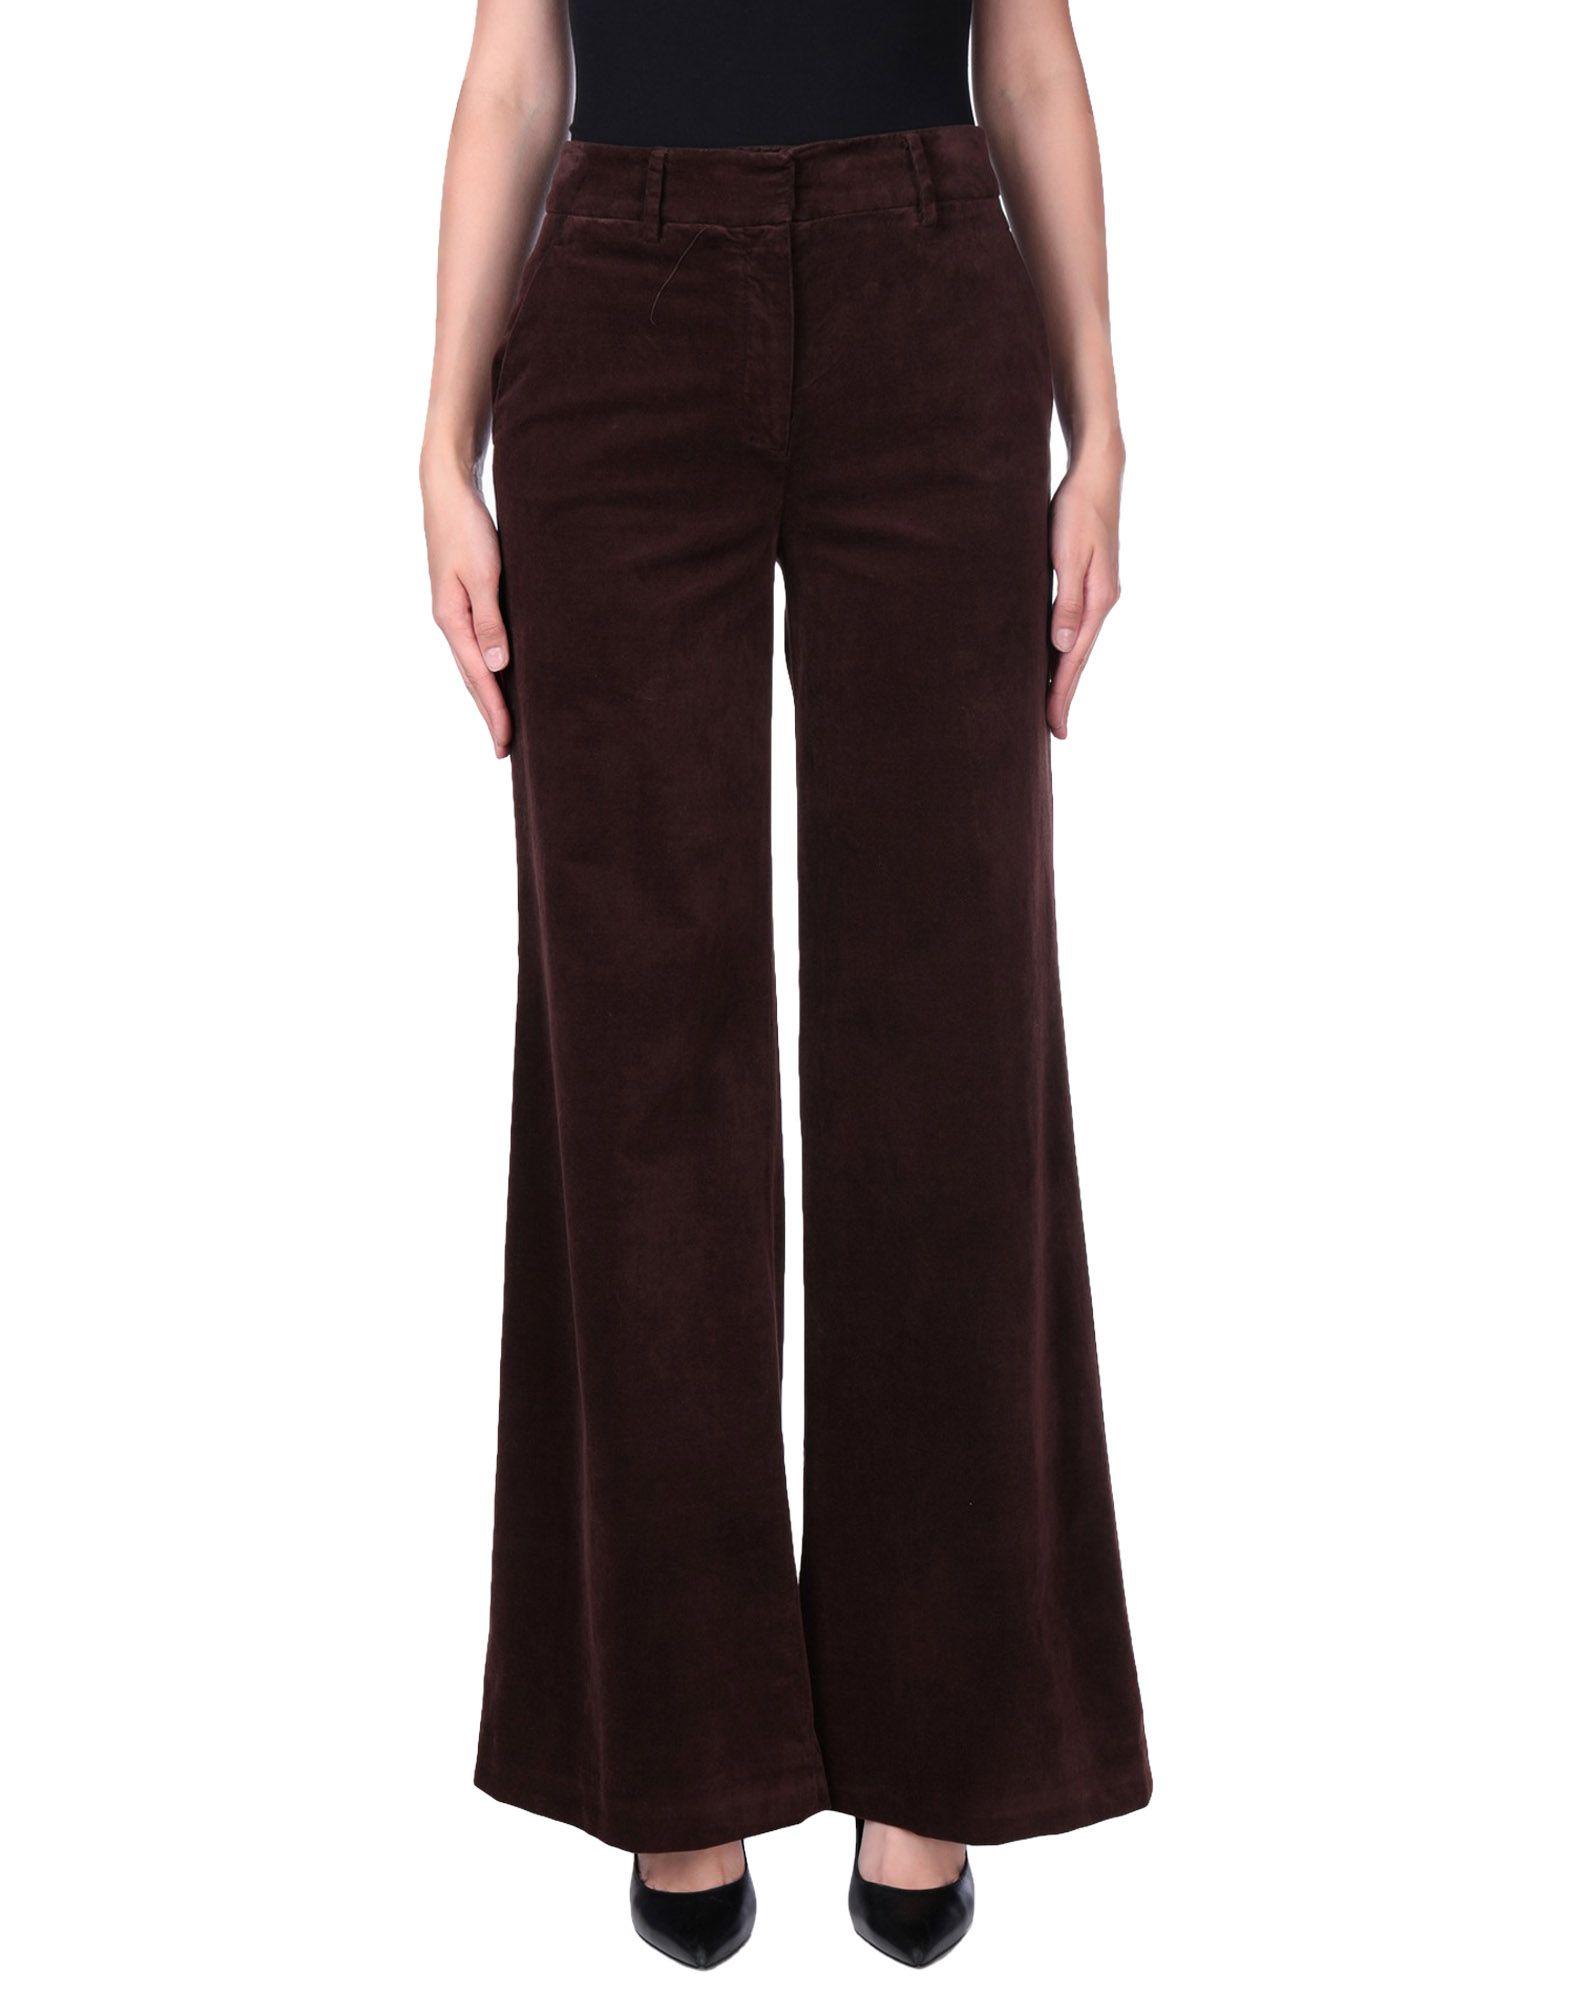 Pantalone Faberge&Roches damen - 13223804IH